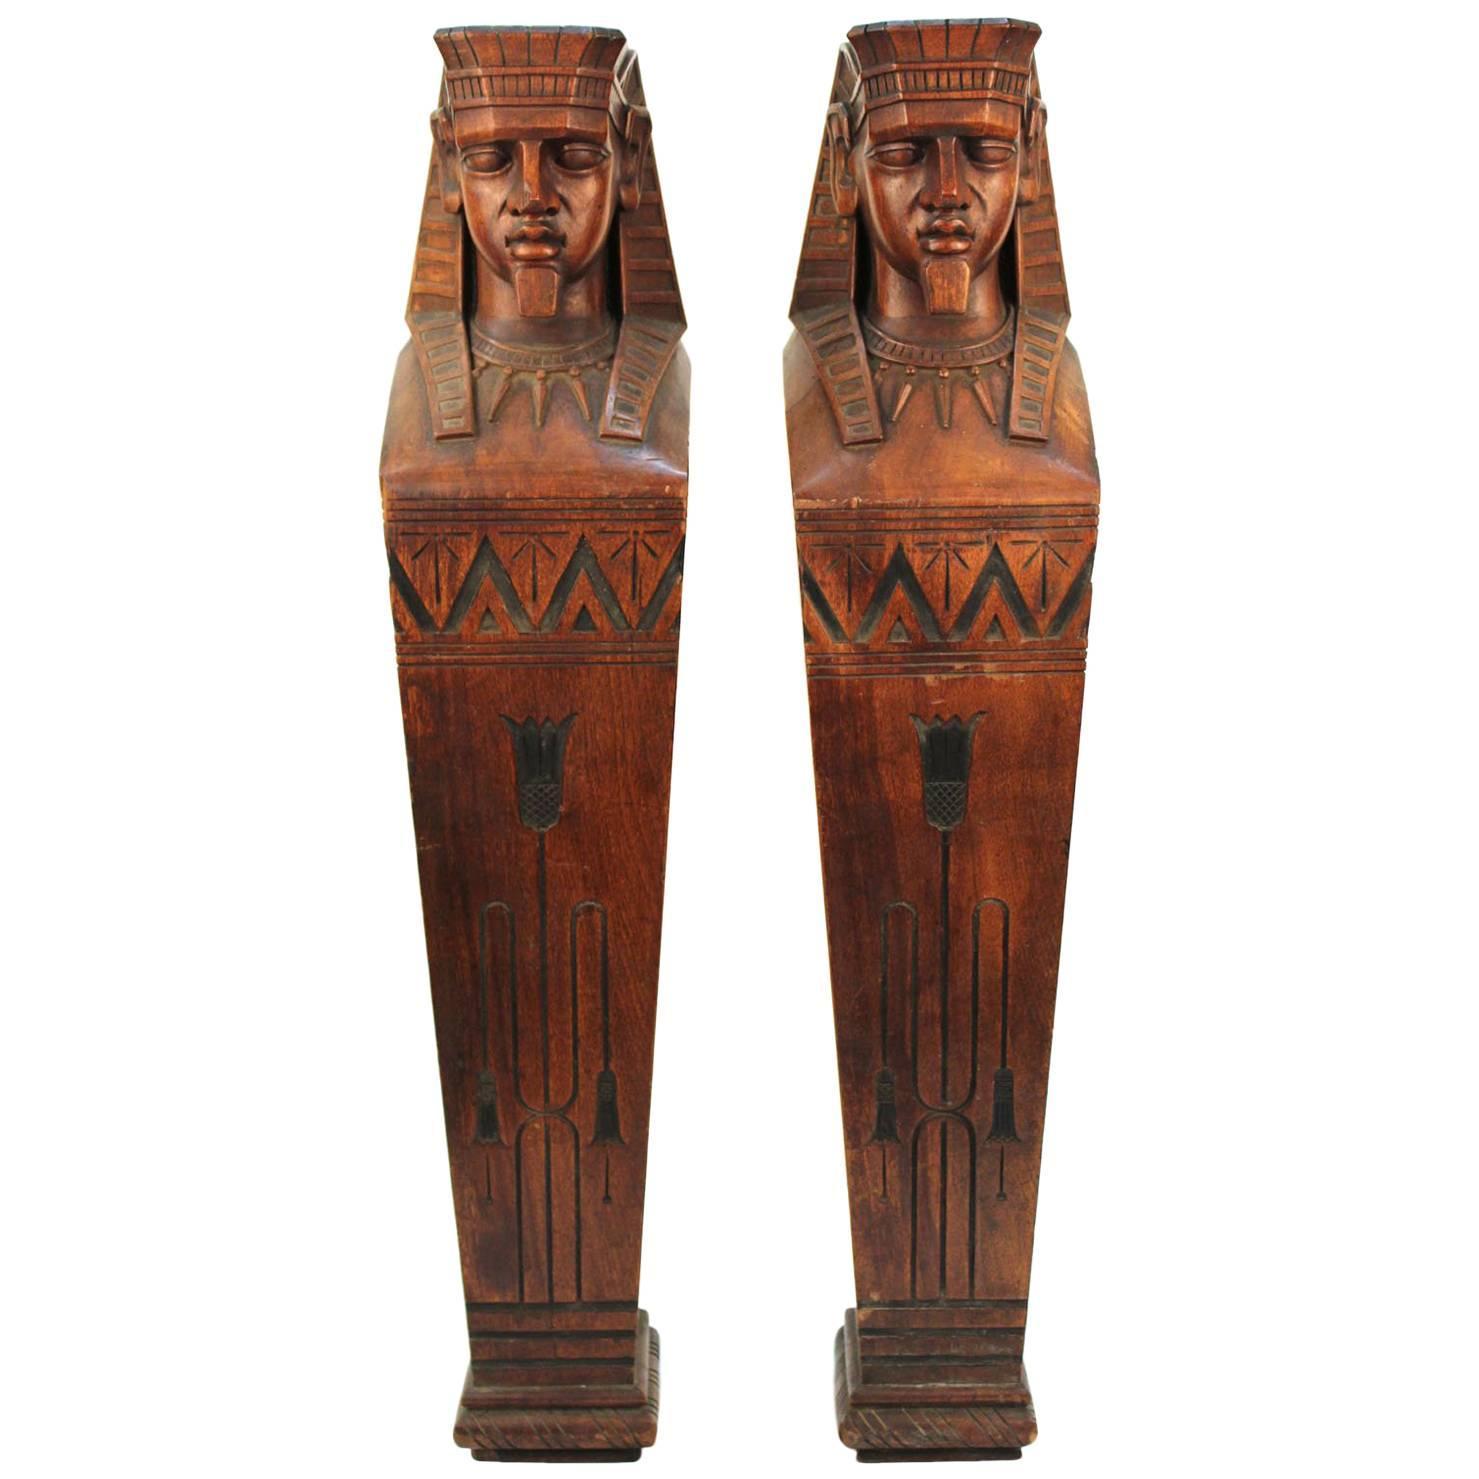 American Egyptian Revival Carved Wood Pair of Pharaoh Caryatids